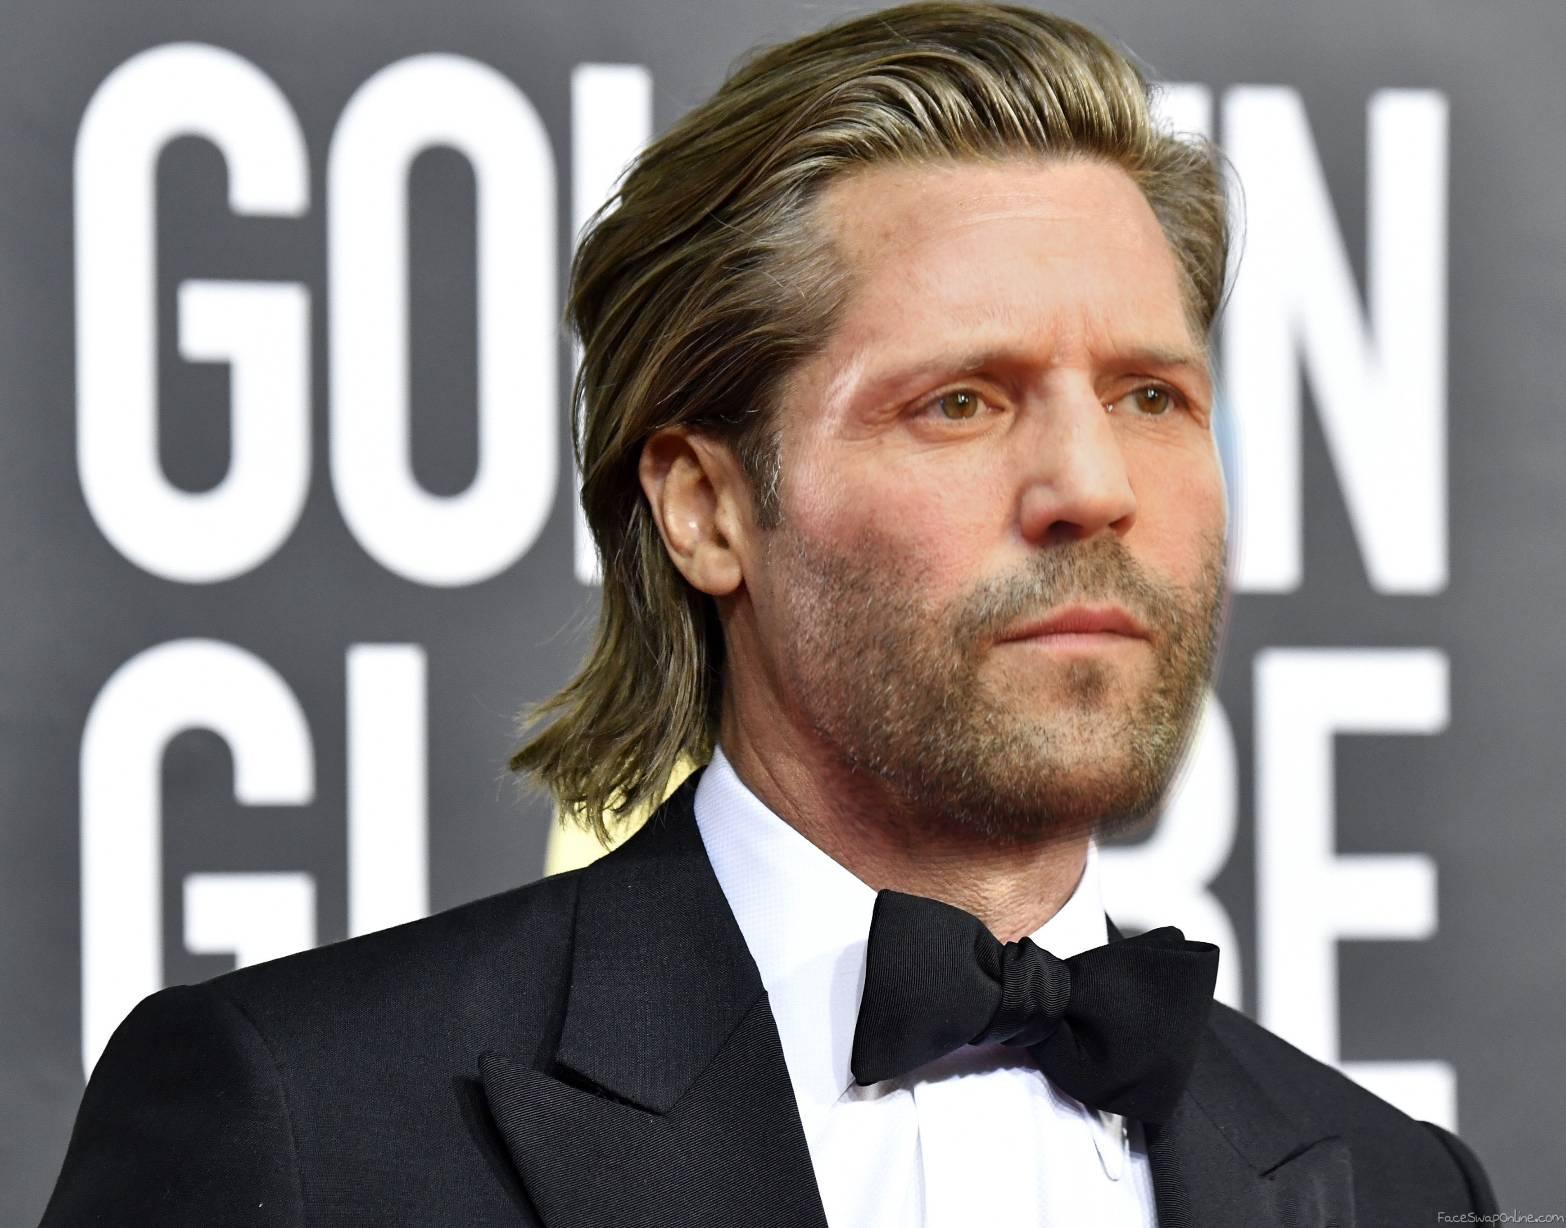 Jason Statham with hair (Brad Pitt's haircut)